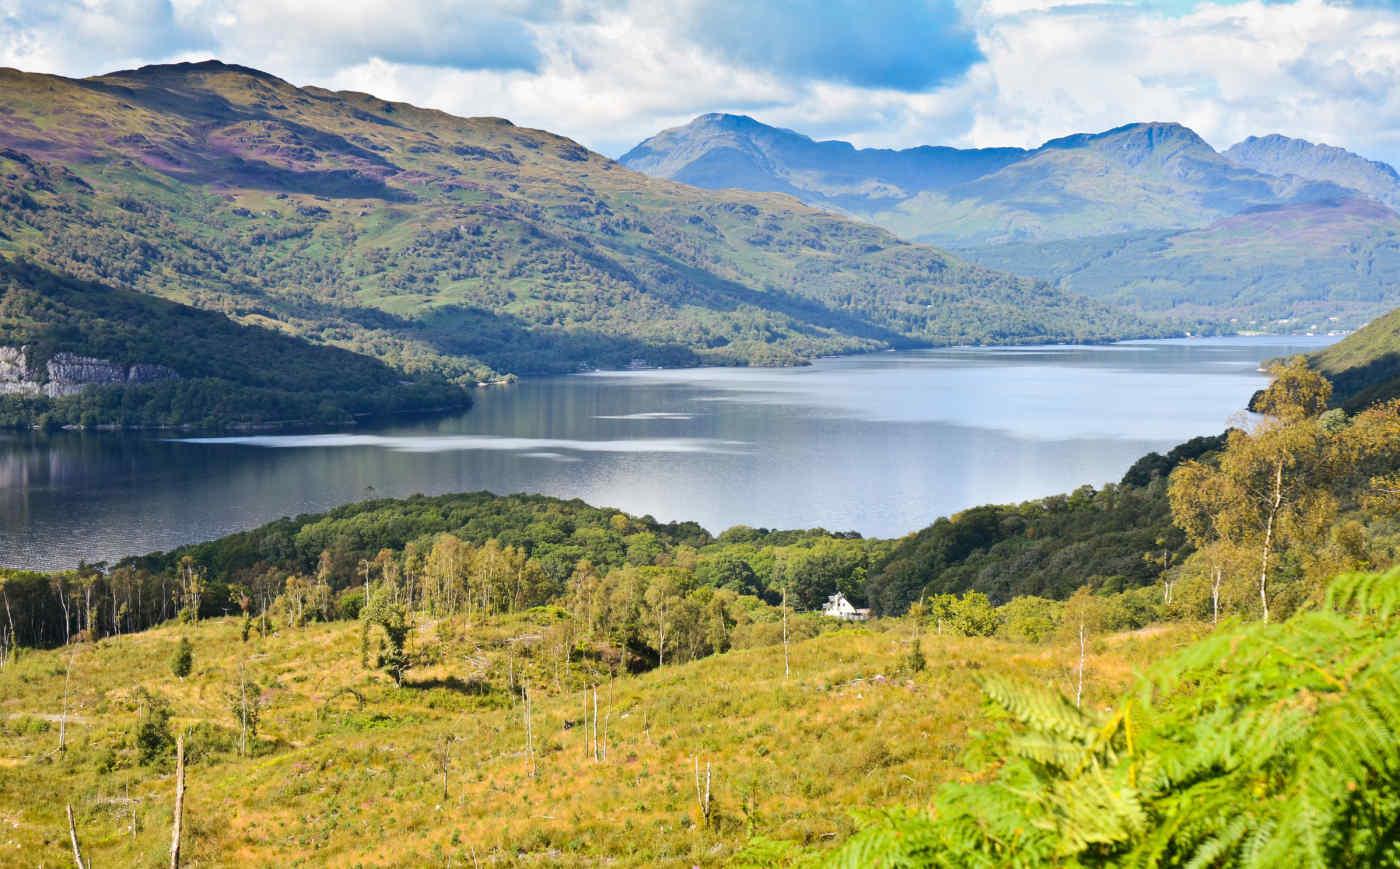 Loch Lomond & The Trossachs National Park, Scotland